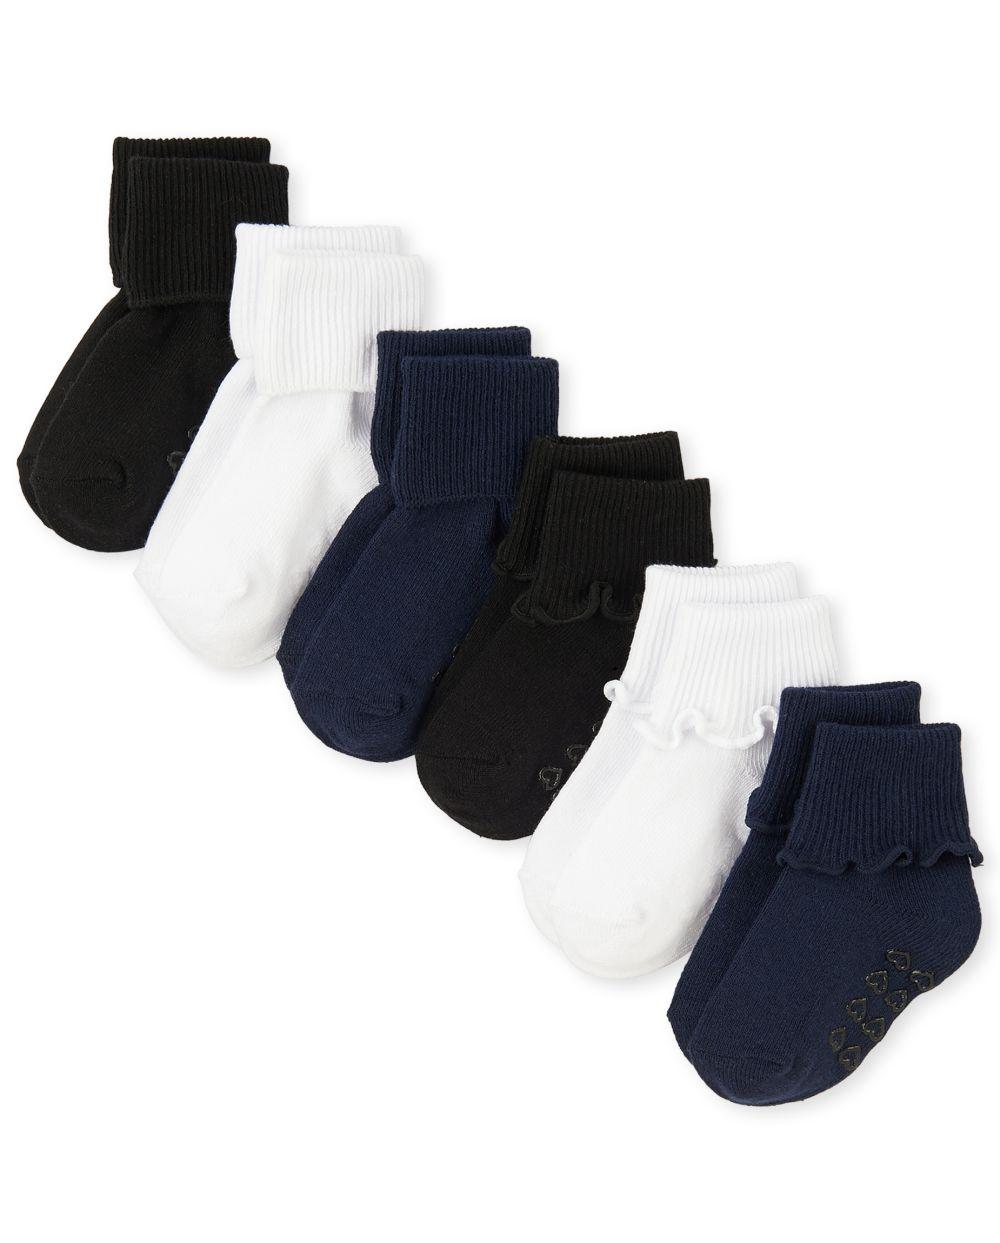 Toddler Girls Uniform Ruffle Turn Cuff Socks 6-Pack